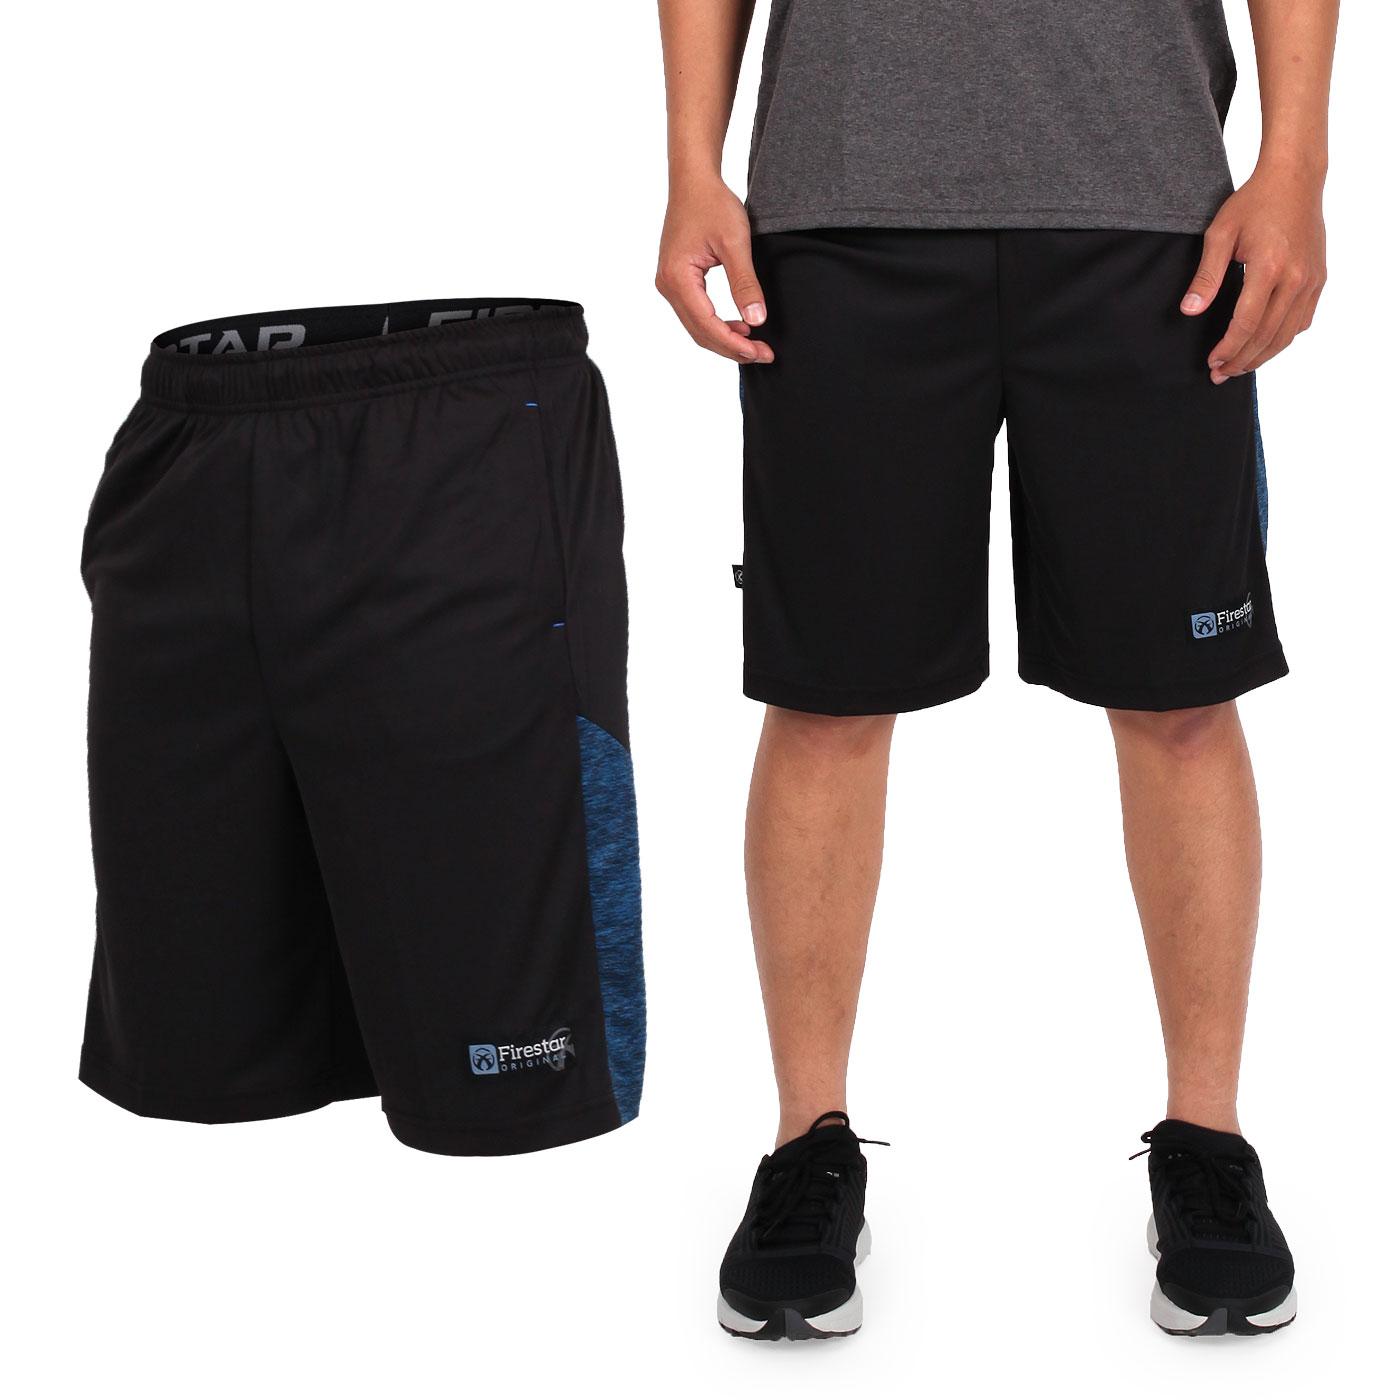 FIRESTAR 男籃球褲 B7605-10 - 黑藍